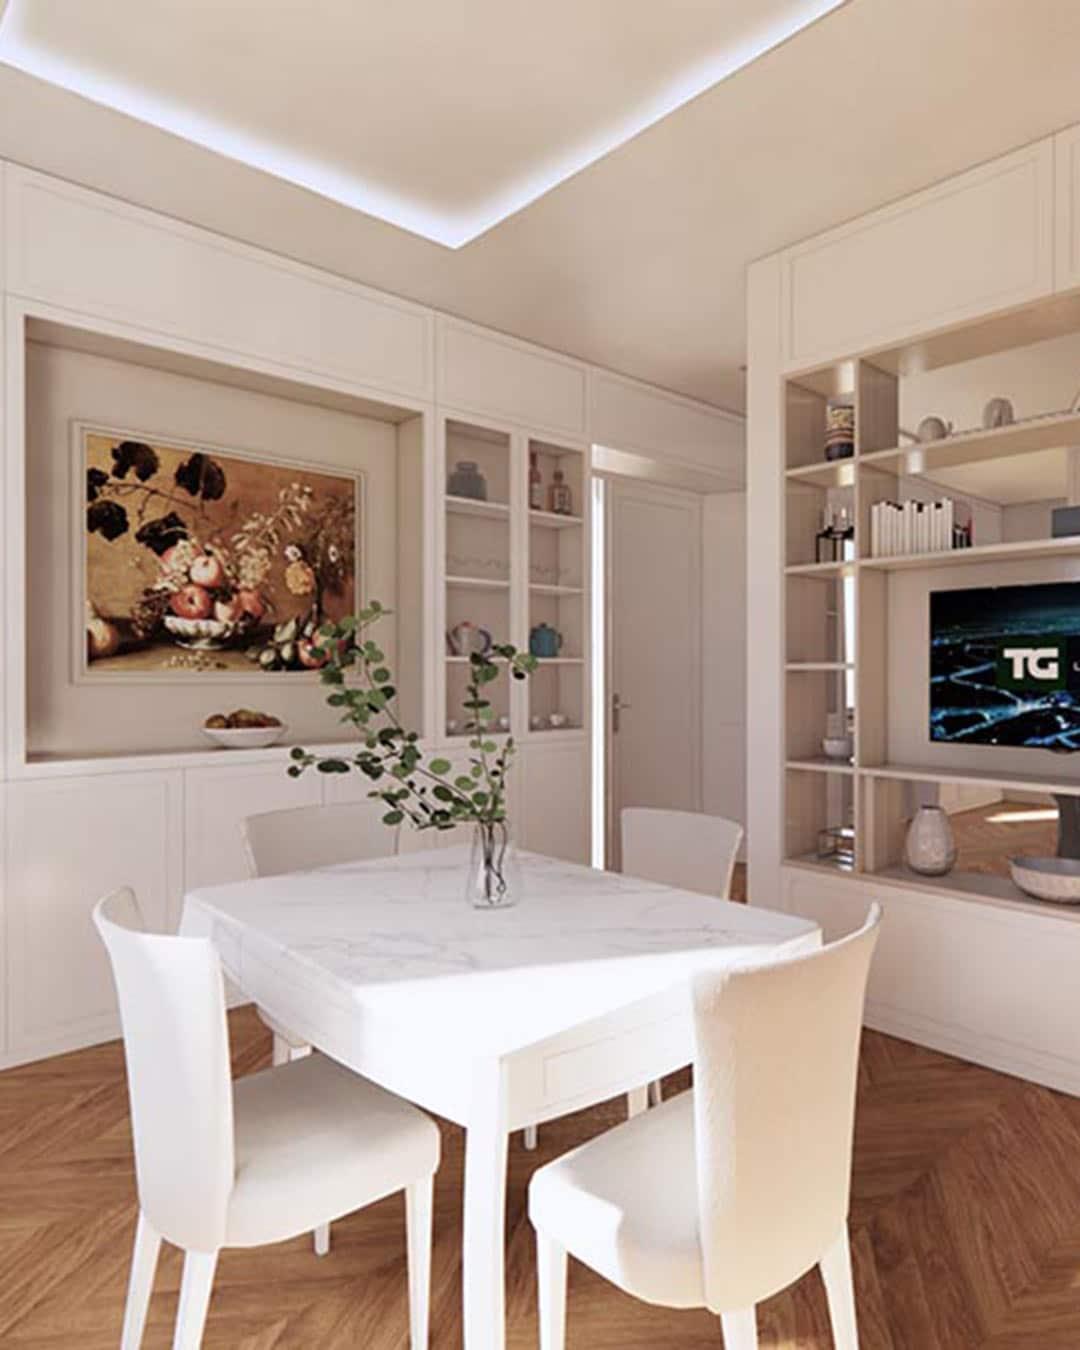 Daniele | Consulenza Design